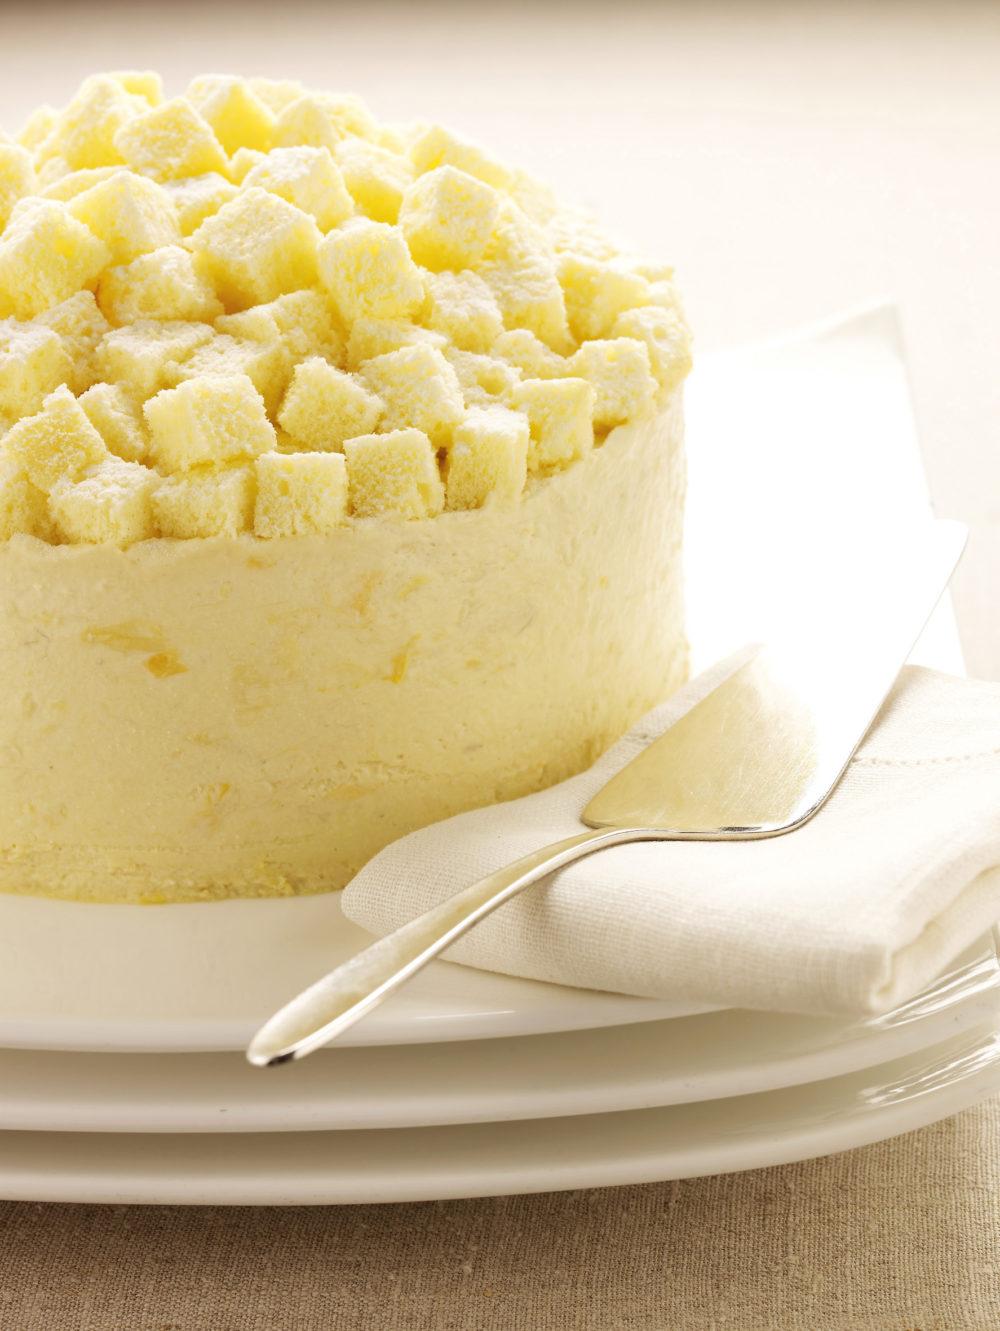 Goodwood Park Hotel Durian Mousse Cake (close up)